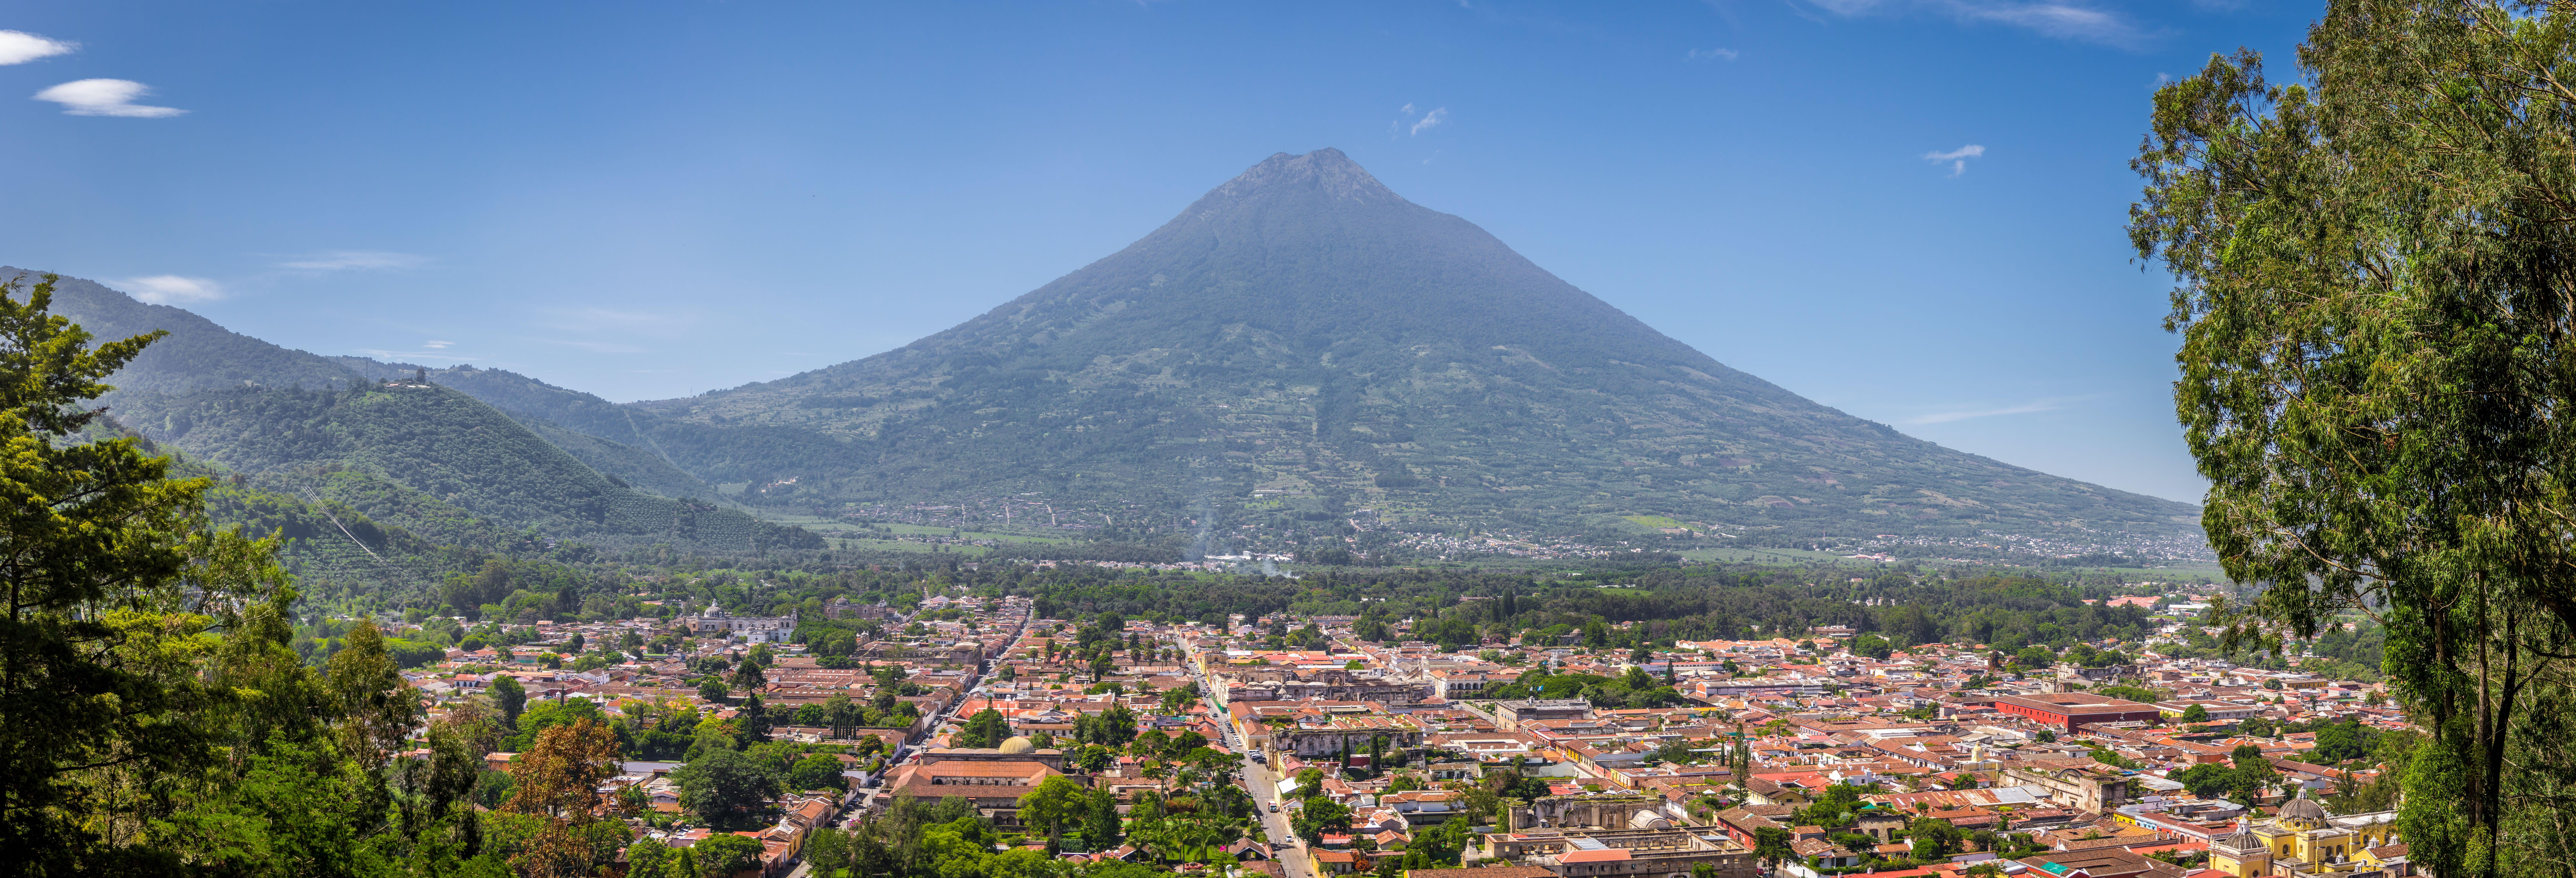 Circuito de 4 dias pela Guatemala